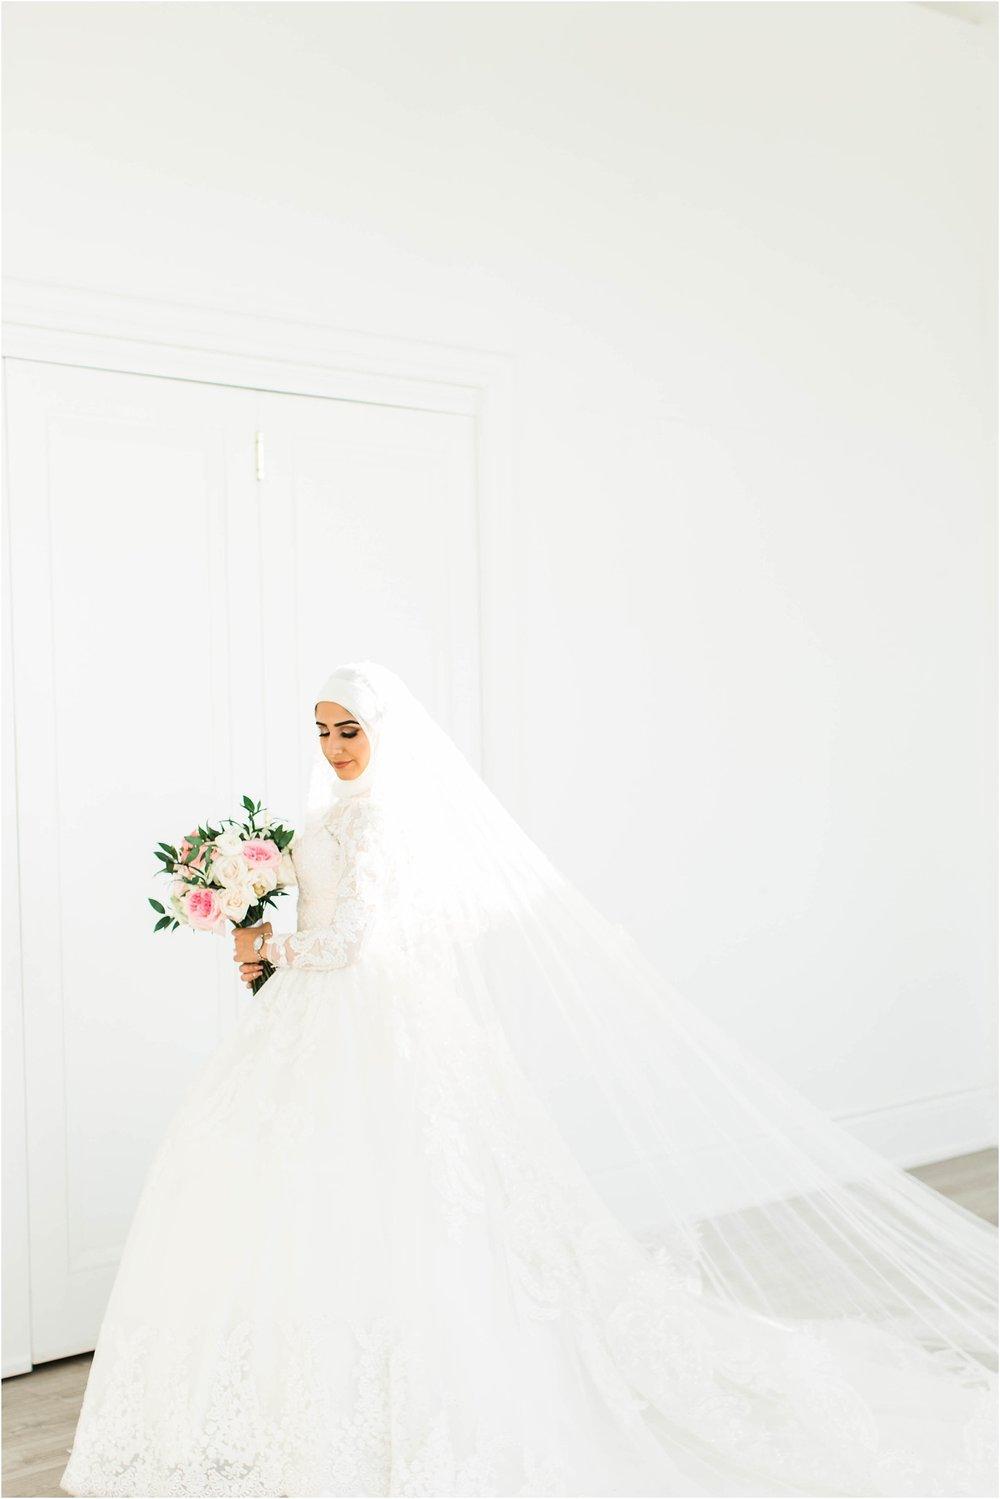 Red-Rose-Convention-Mint-Room-Wedding-Toronto-Mississauga-Brampton-Scarborough-GTA-Pakistani-Indian-Wedding-Engagement-Photographer-Photography_0100.jpg